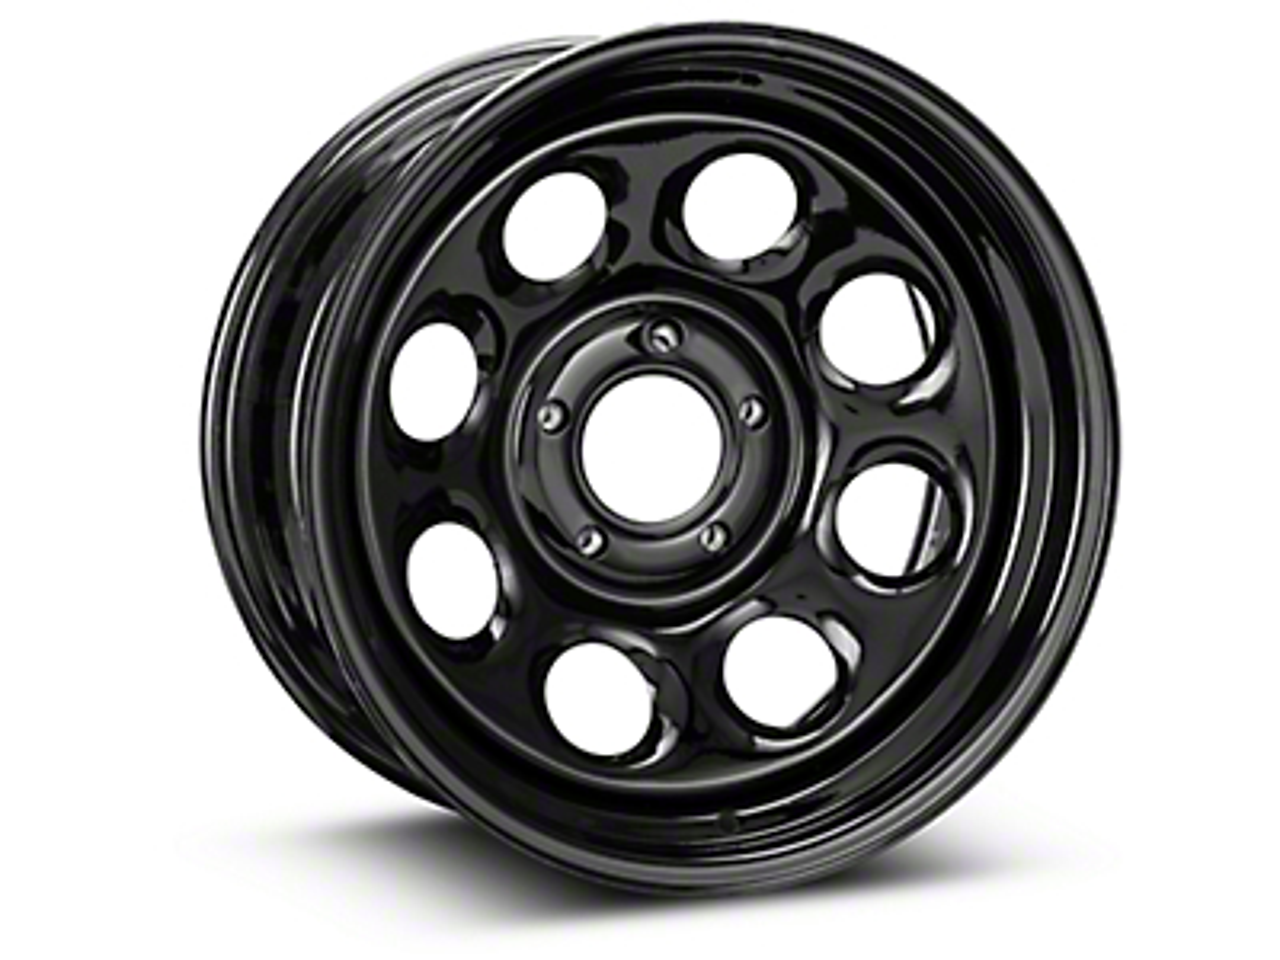 Pro Comp Steel Series 98 Rock Crawler Gloss Black Wheel - 17x8 (07-18 Wrangler JK)